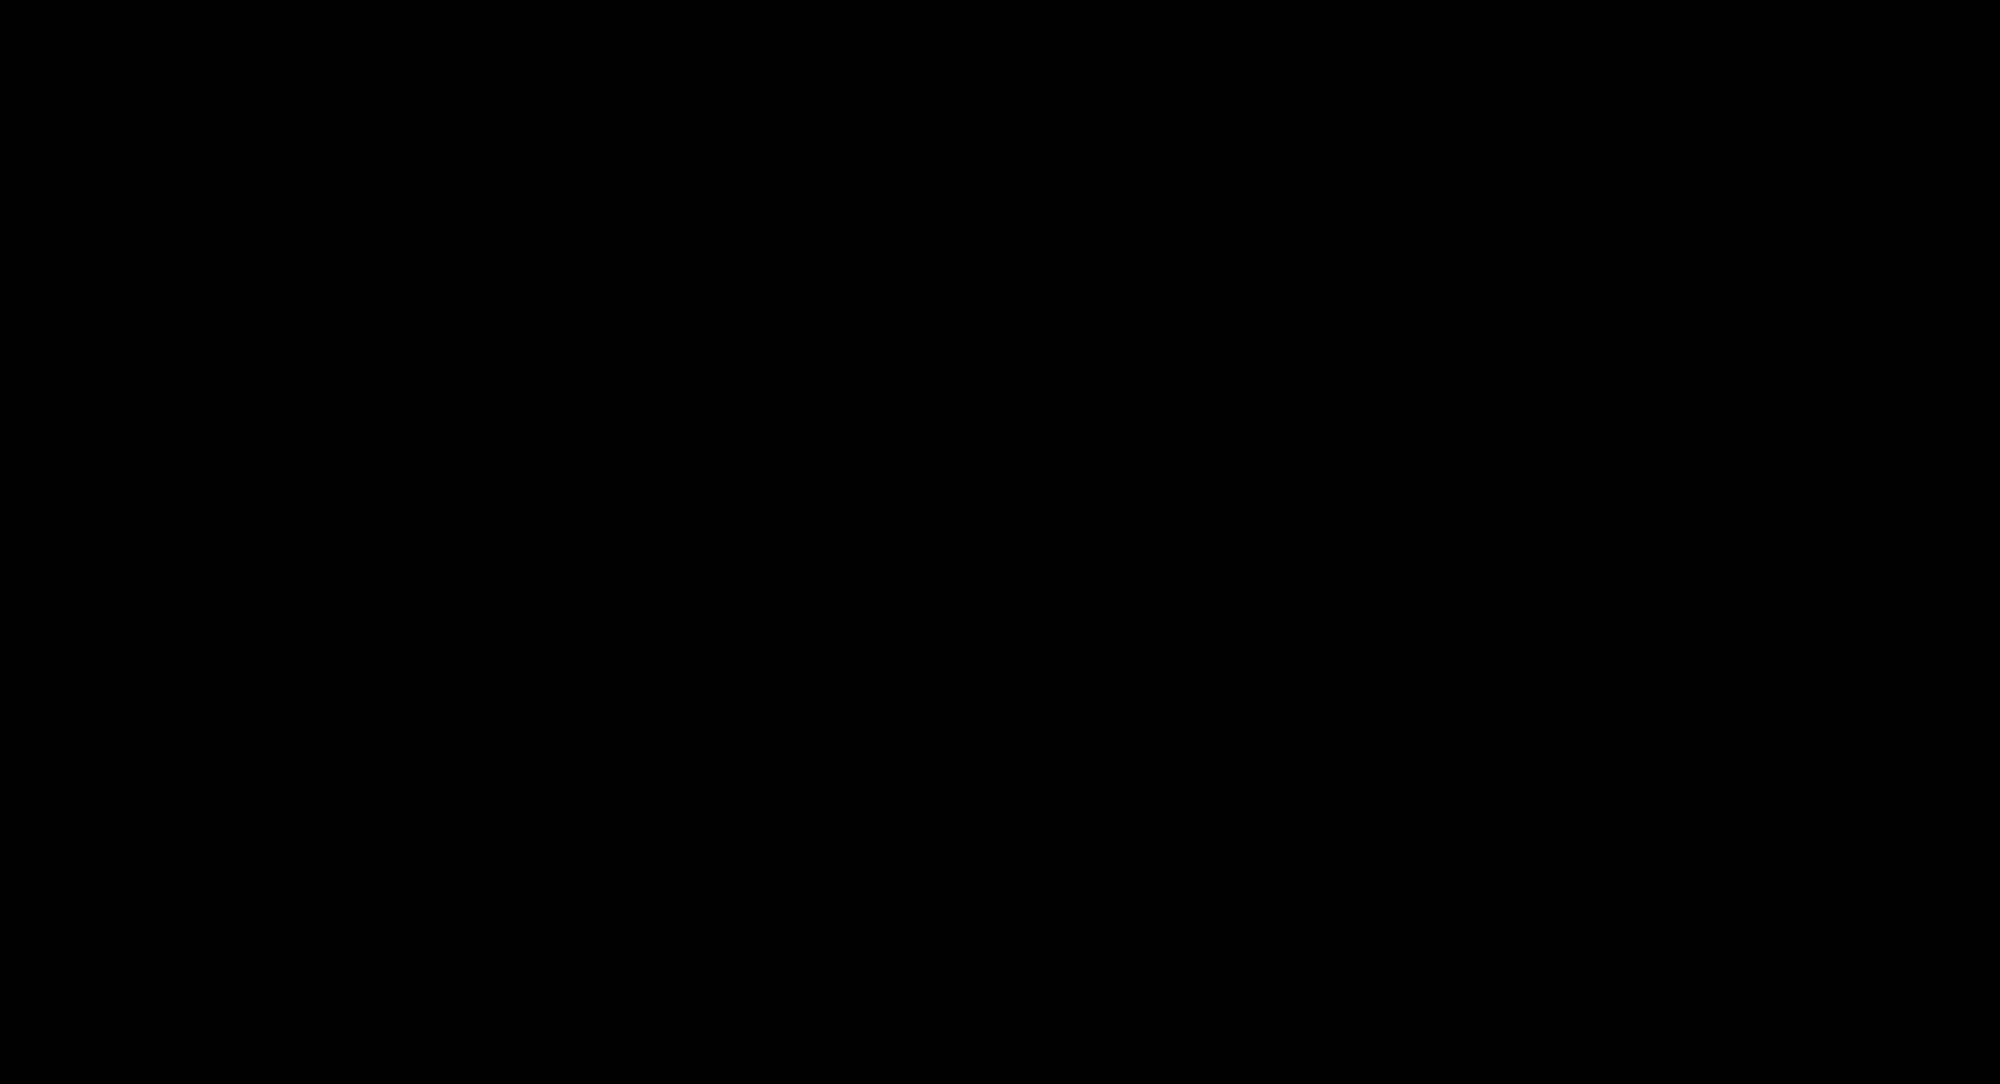 GRO(2)B-logo-black (1).png